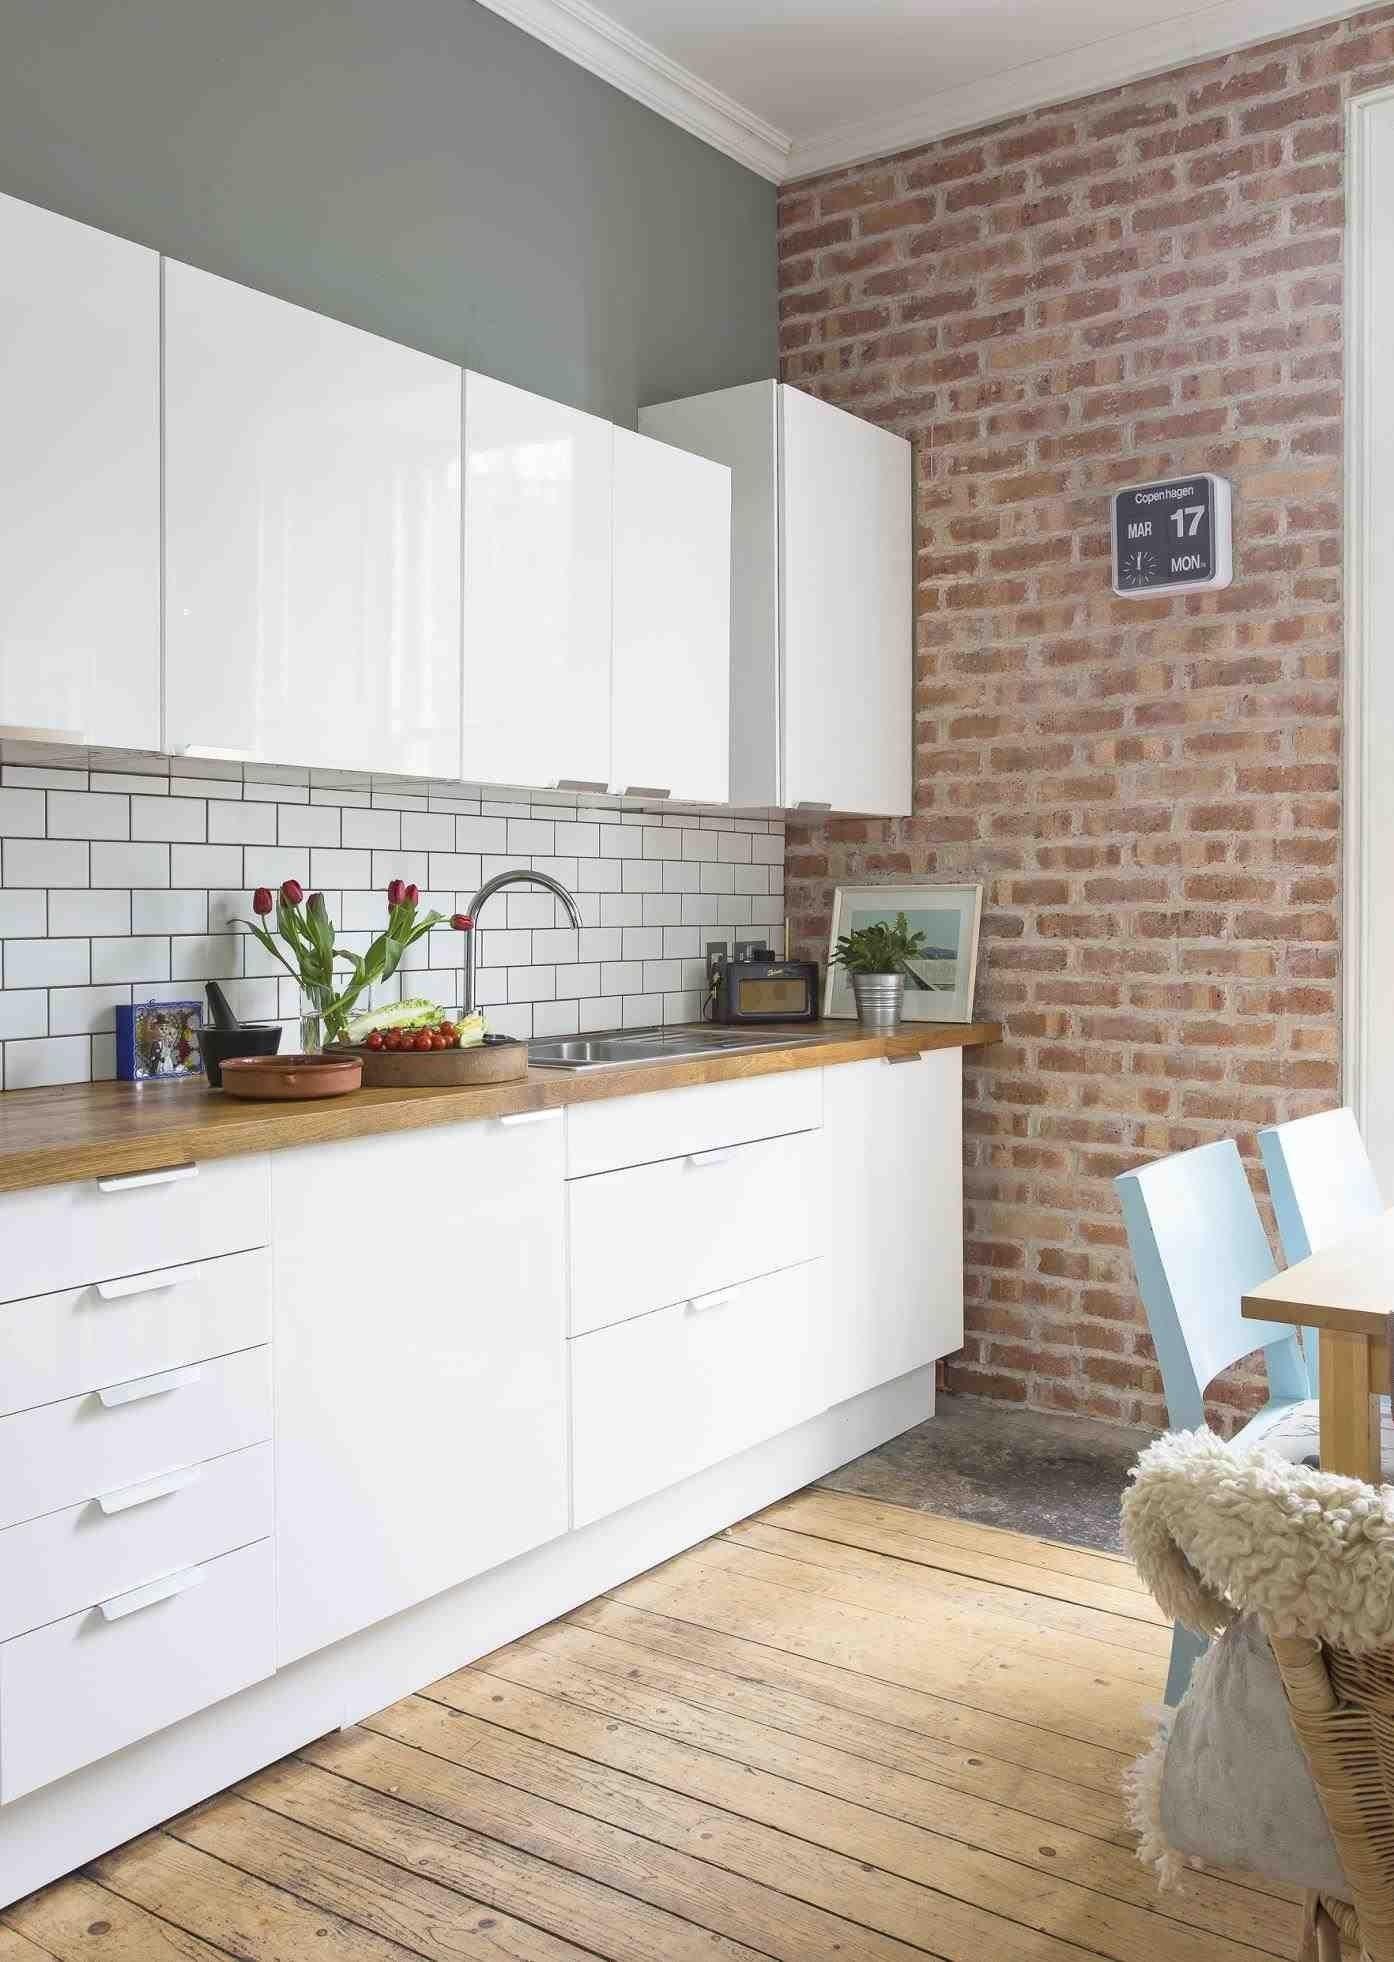 Creative Cute Exposed Brick Kitchen Ideas In 2020 Exposed Brick